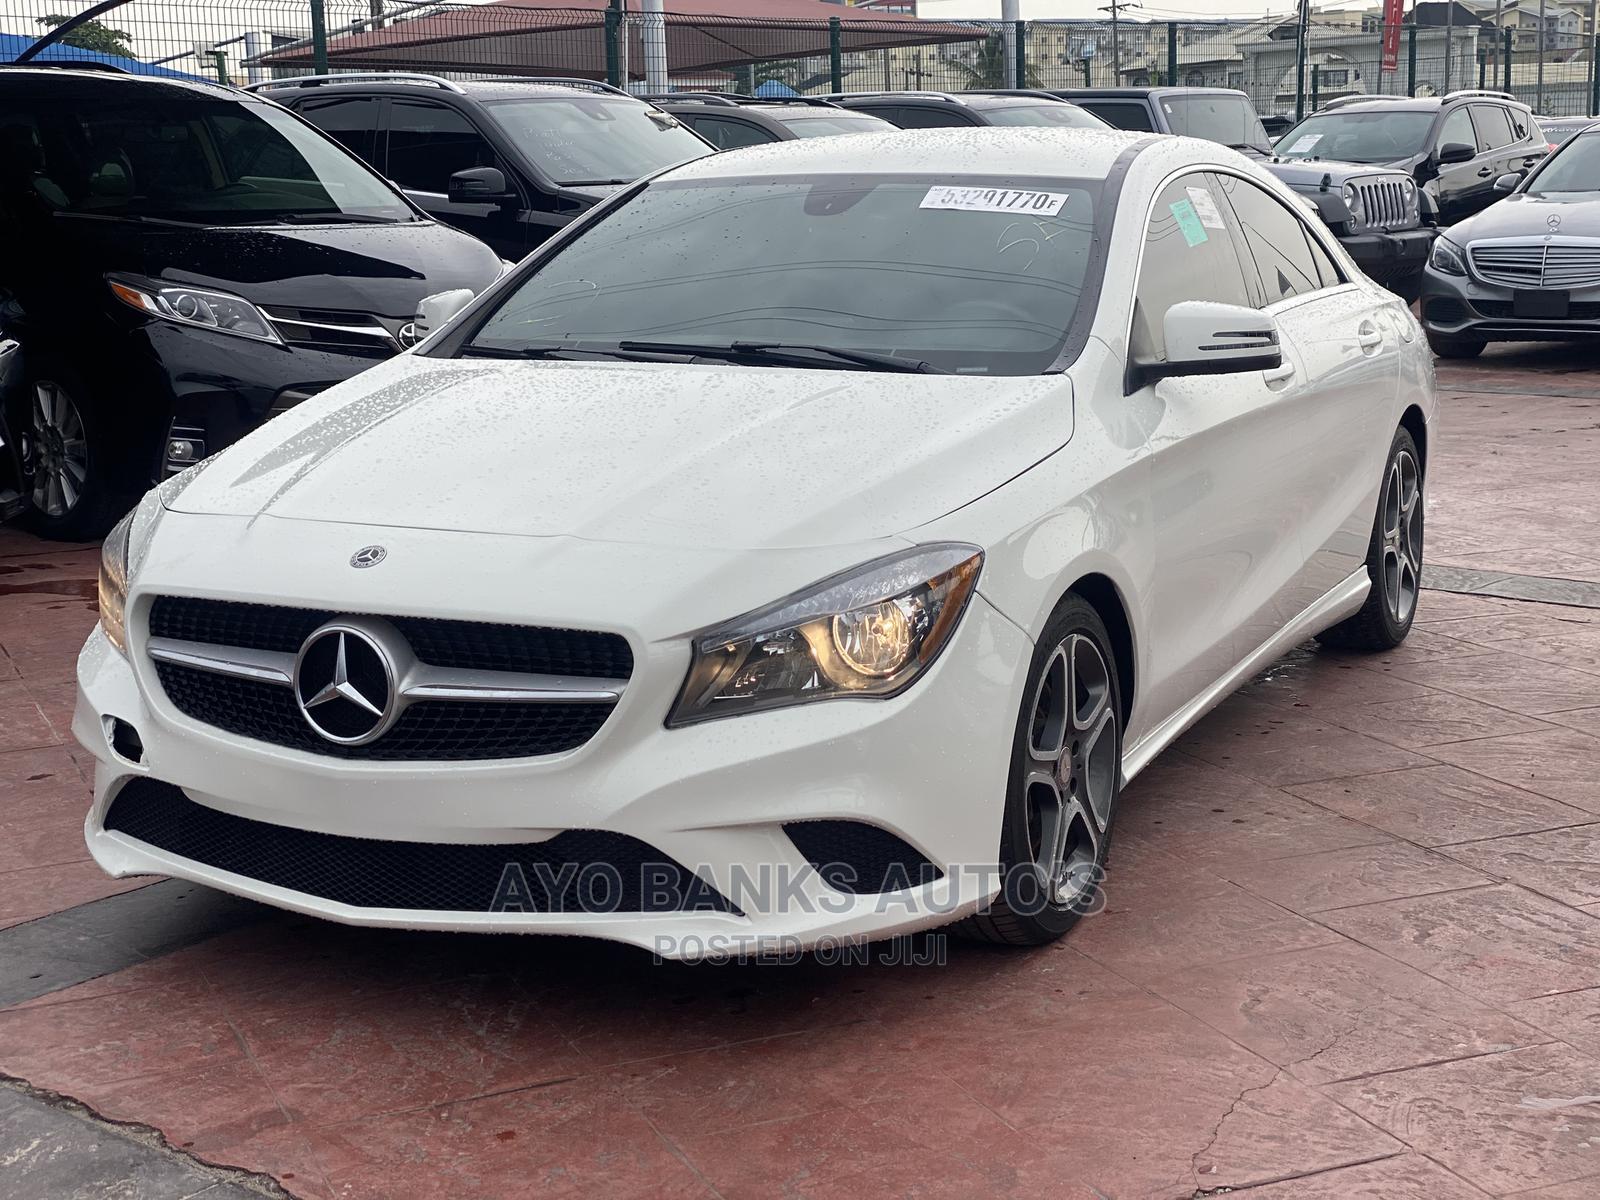 Mercedes-Benz CLA-Class 2014 White | Cars for sale in Lekki, Lagos State, Nigeria